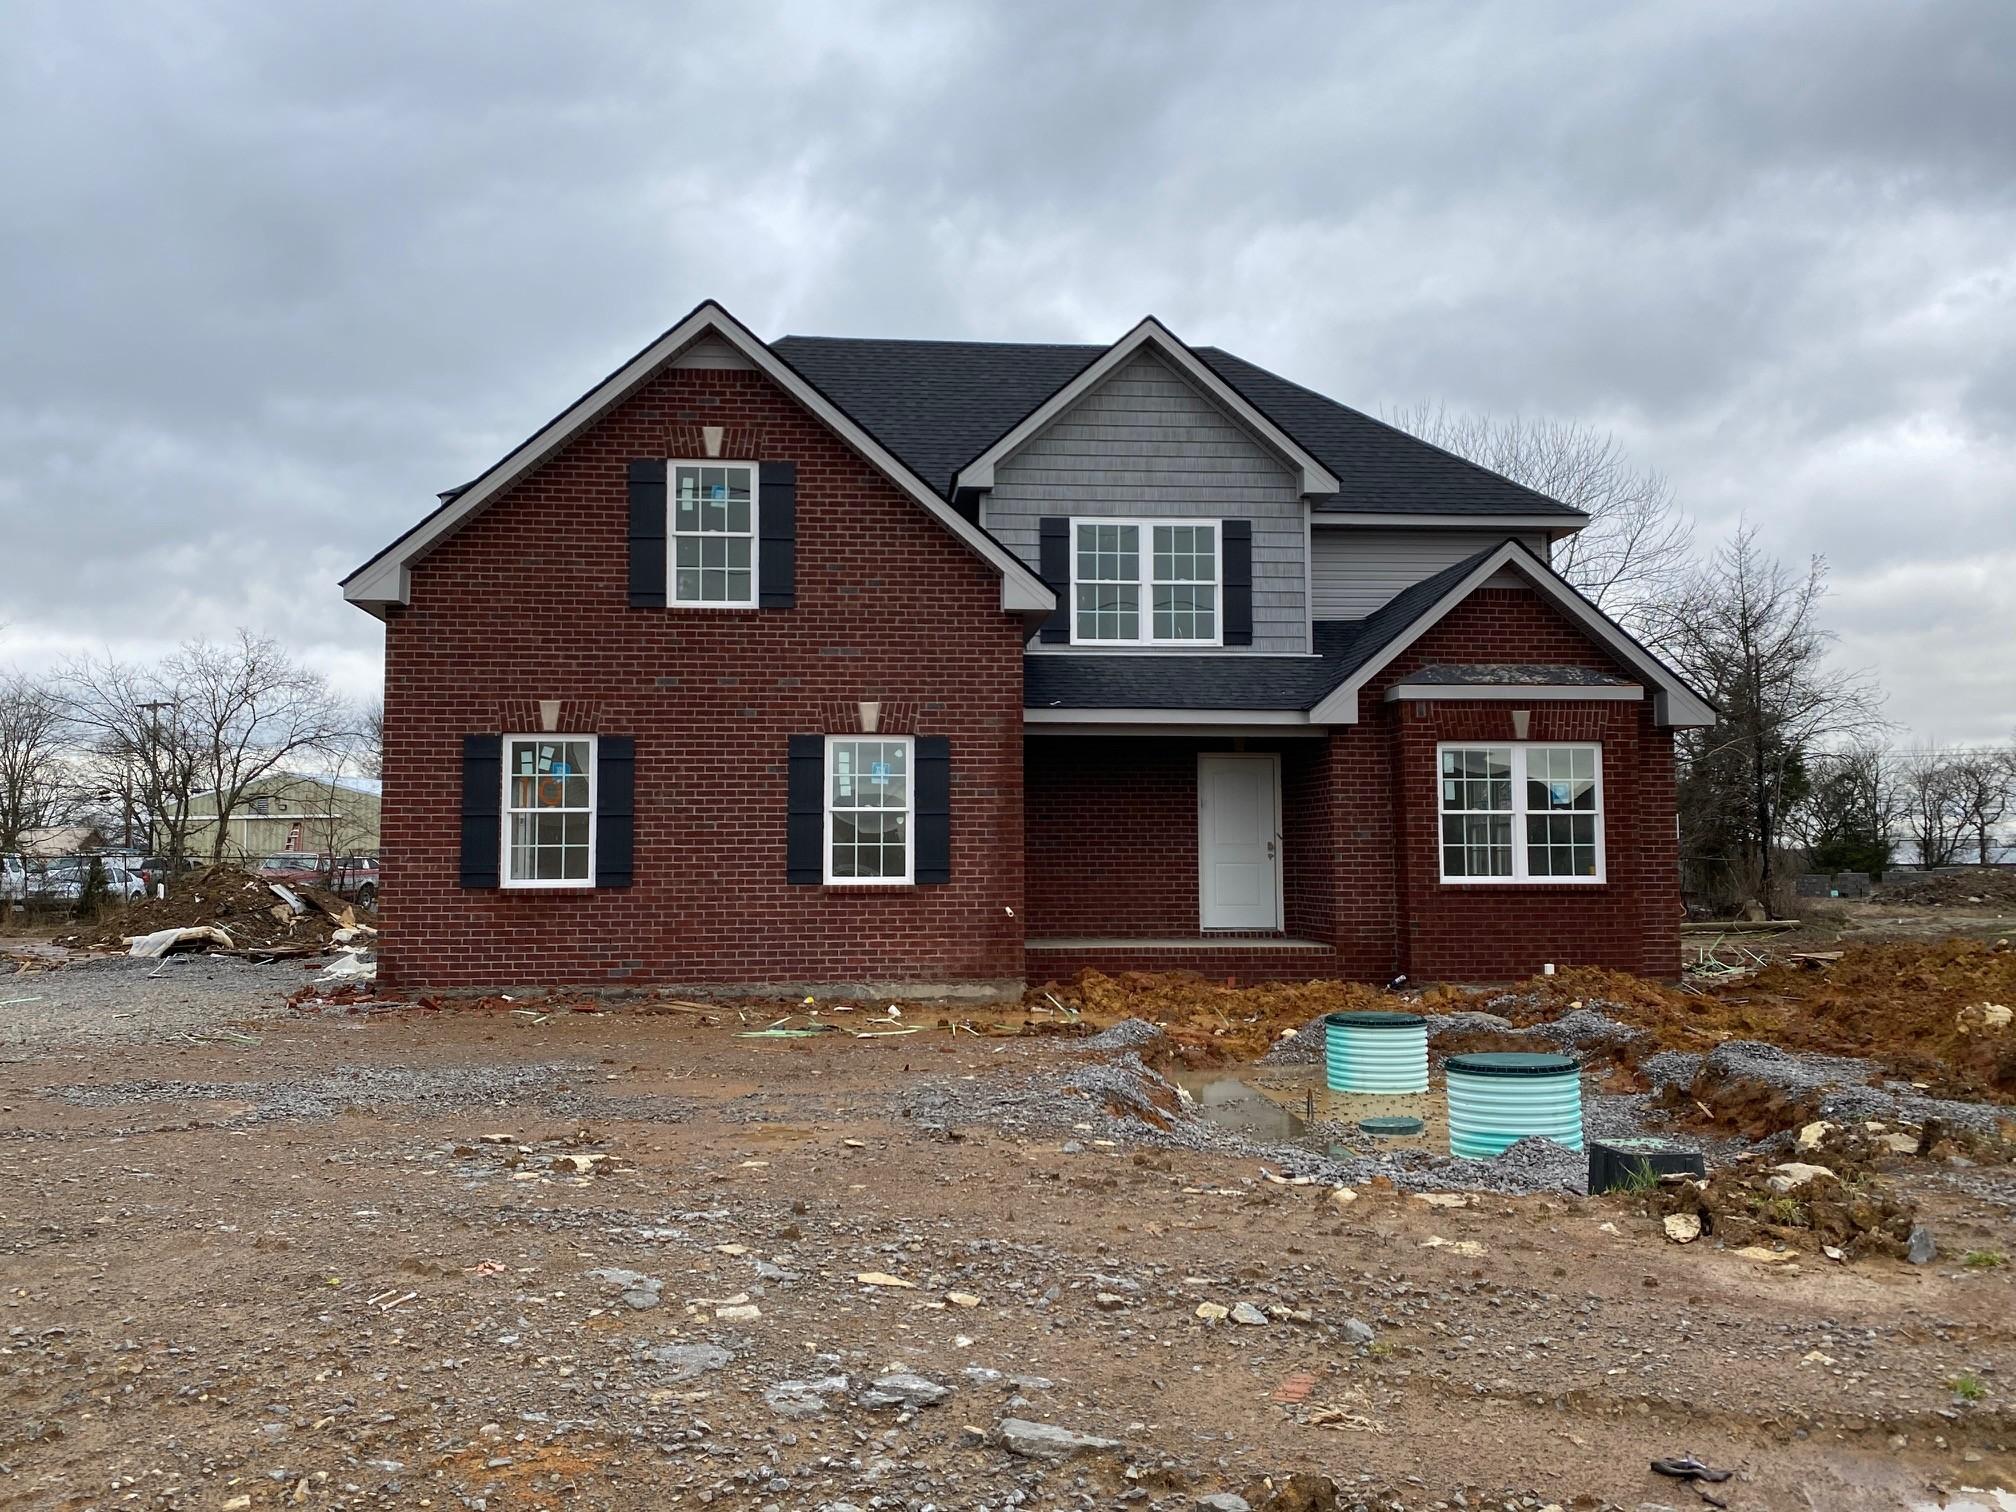 7918 Natahna Ct, Murfreesboro, TN 37127 - Murfreesboro, TN real estate listing